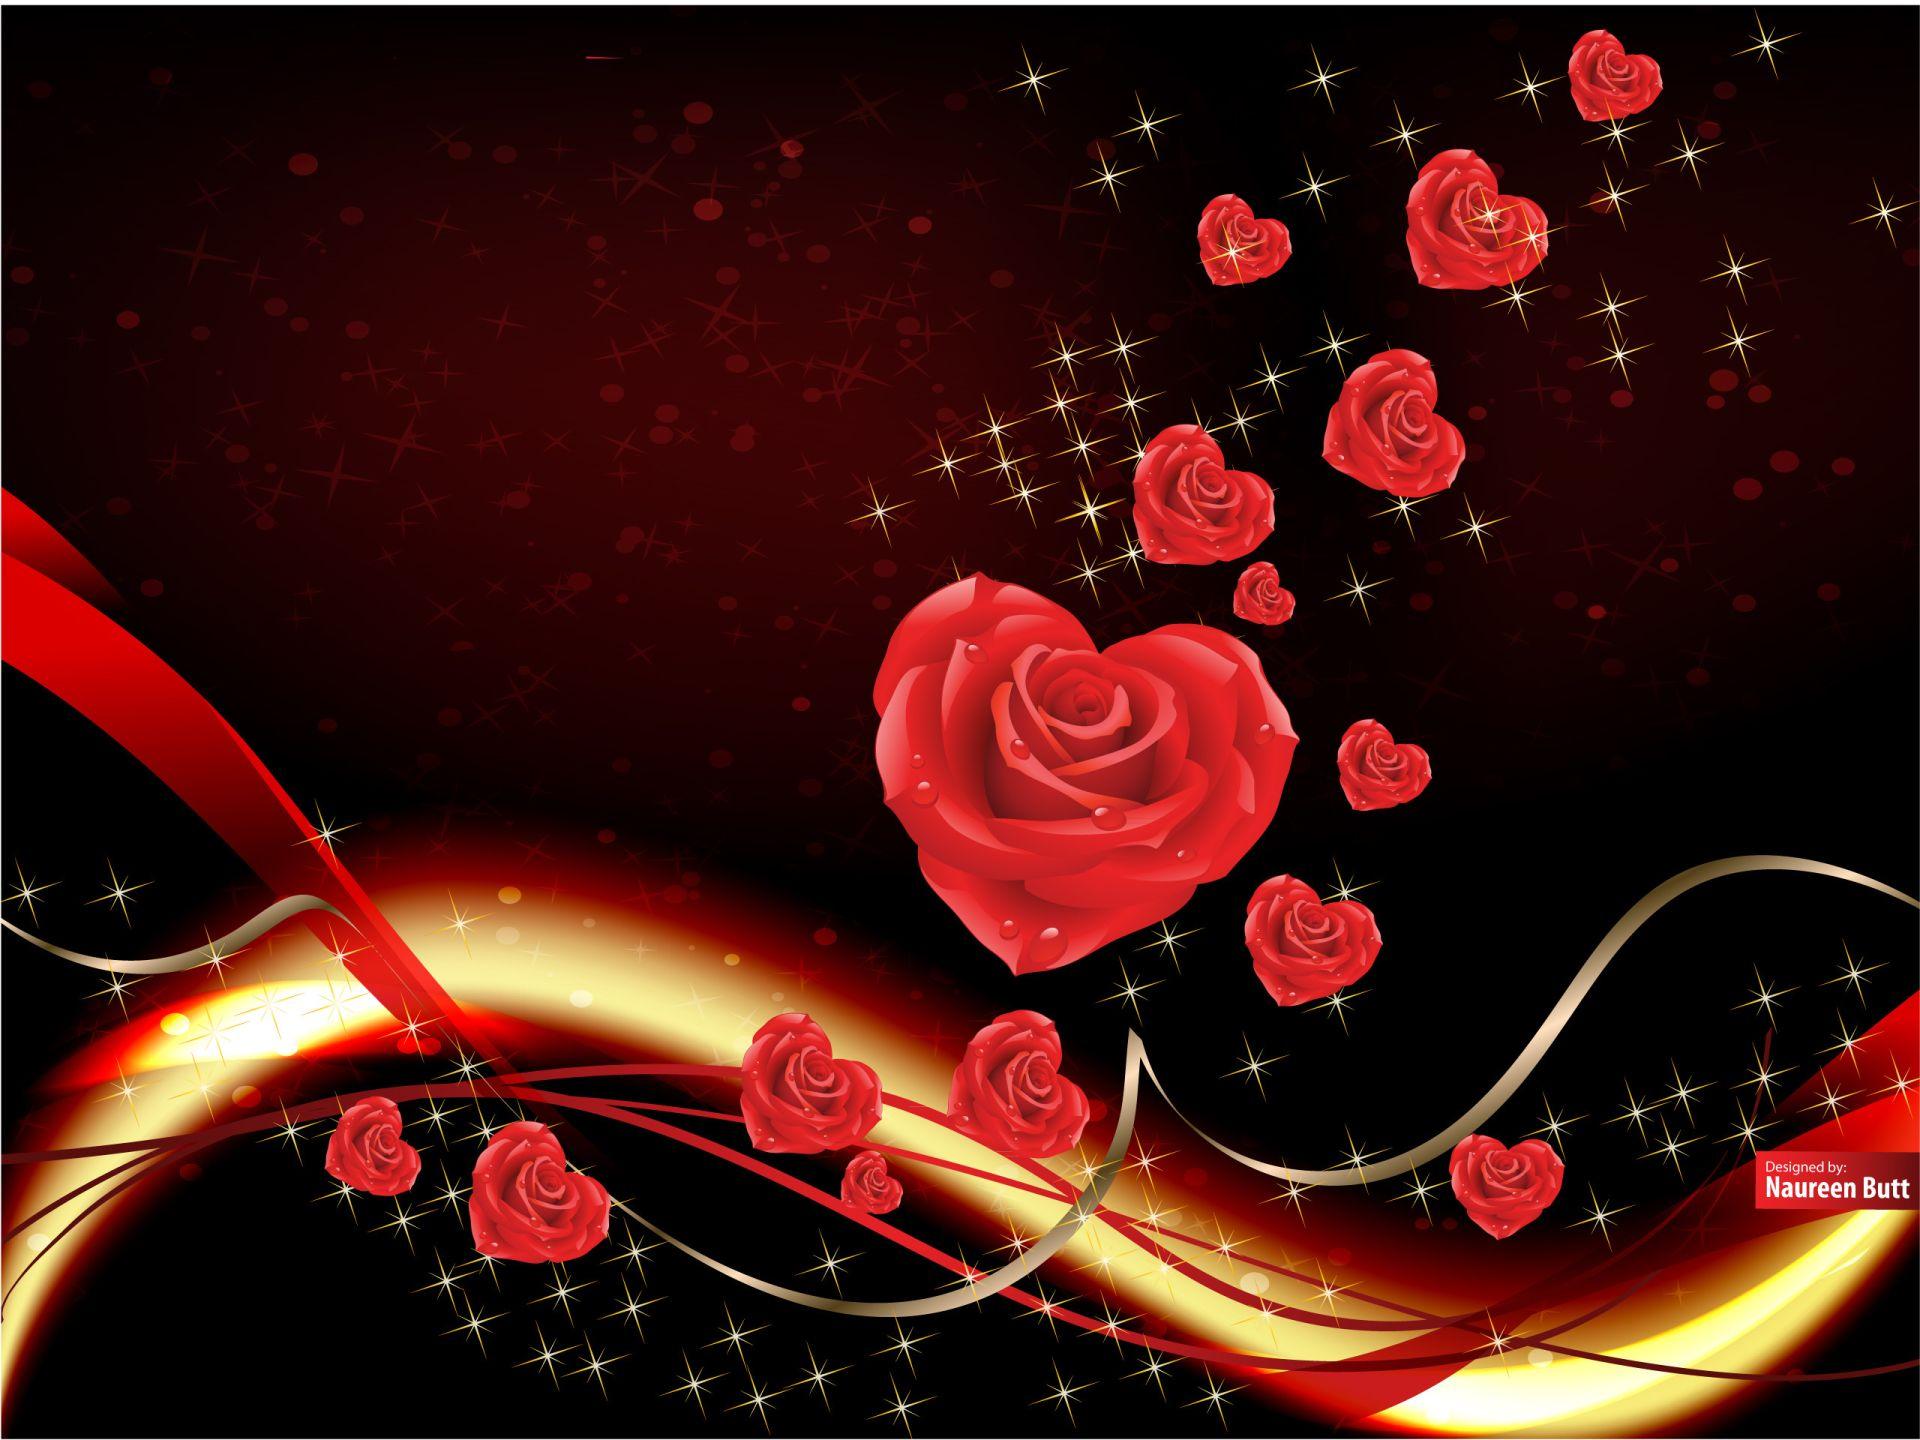 art roses